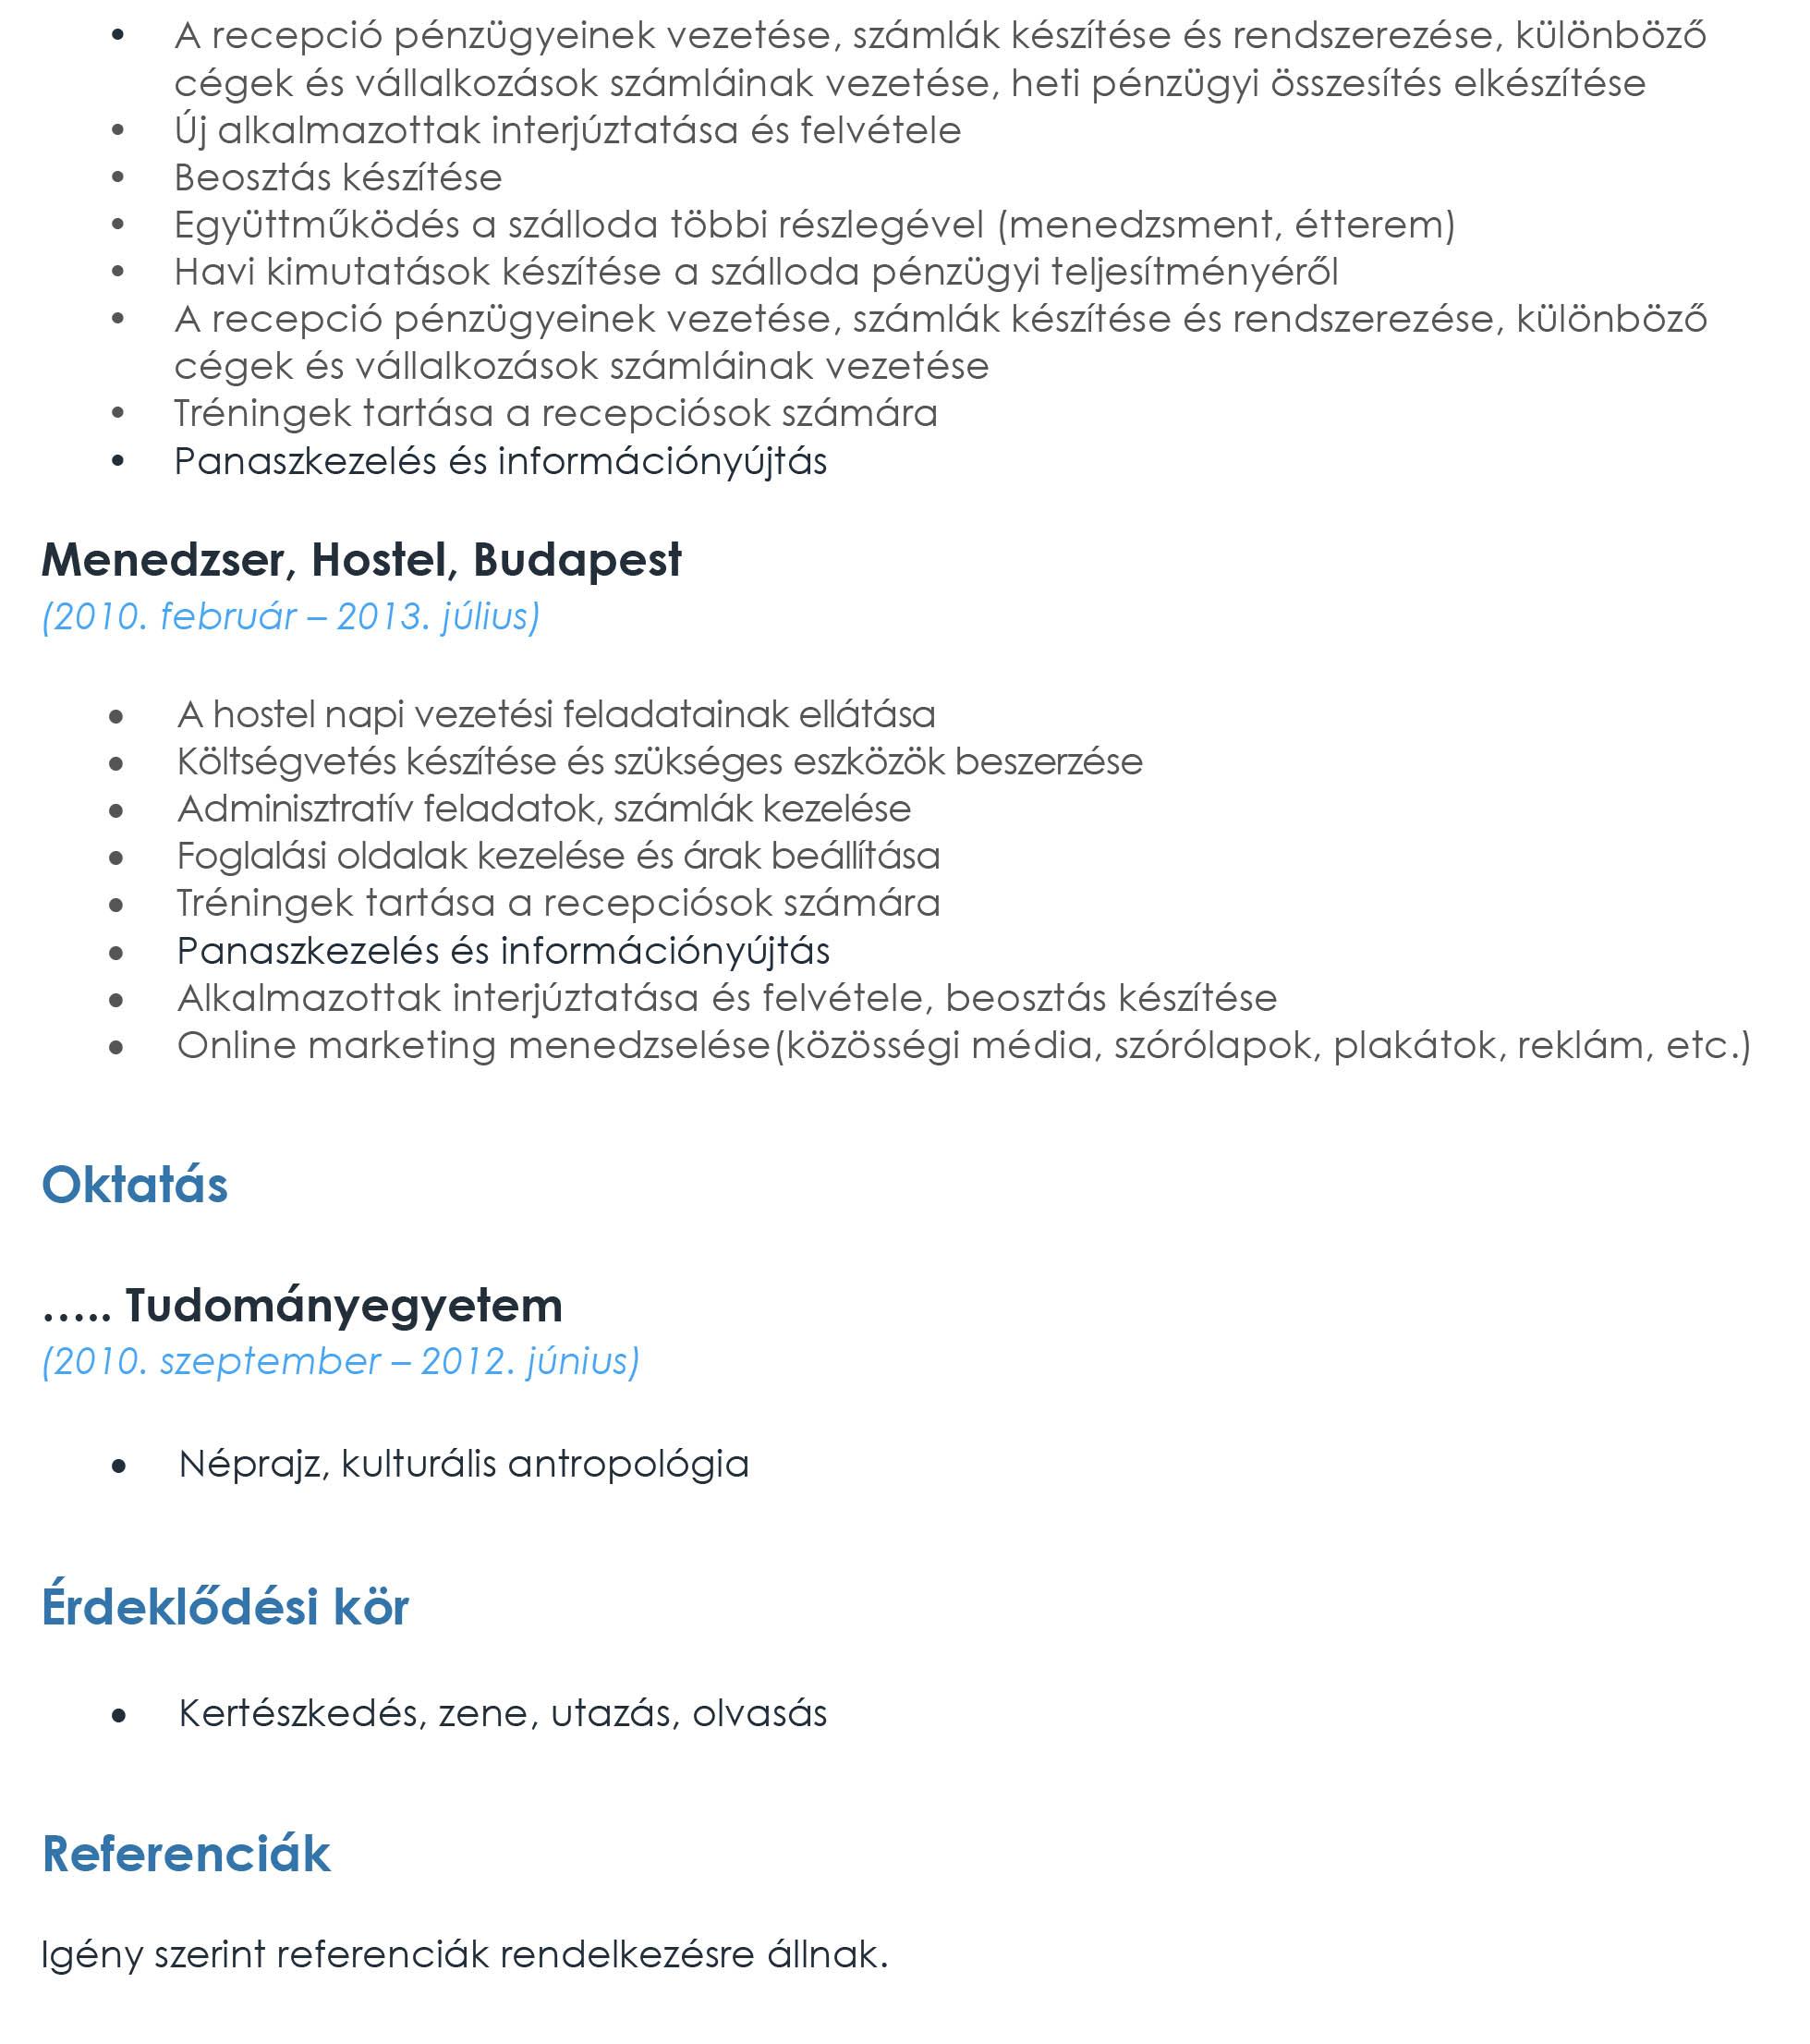 eszter_cv_magyar_admin_pl-2.jpg